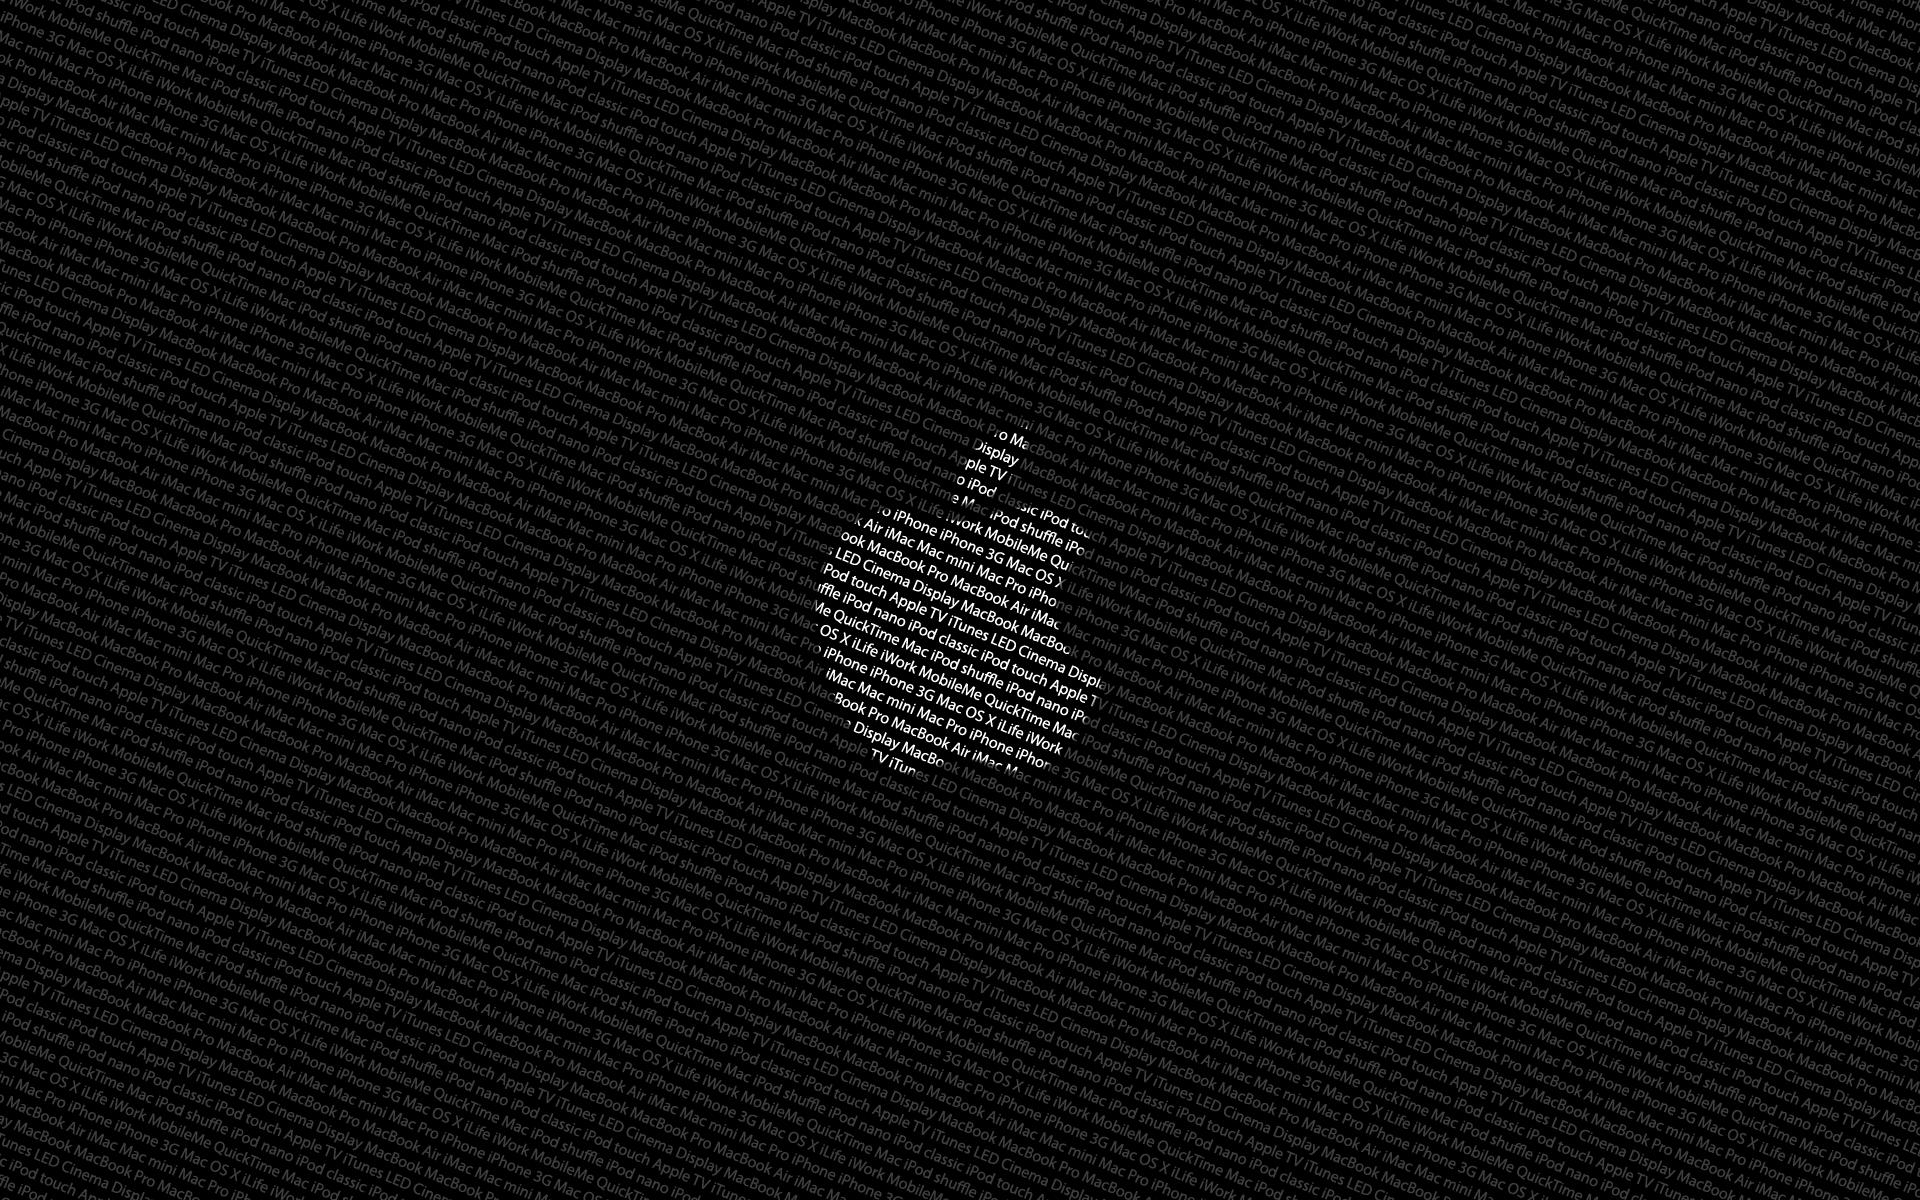 sombrero galaxy mac wallpaper download free mac wallpapers download